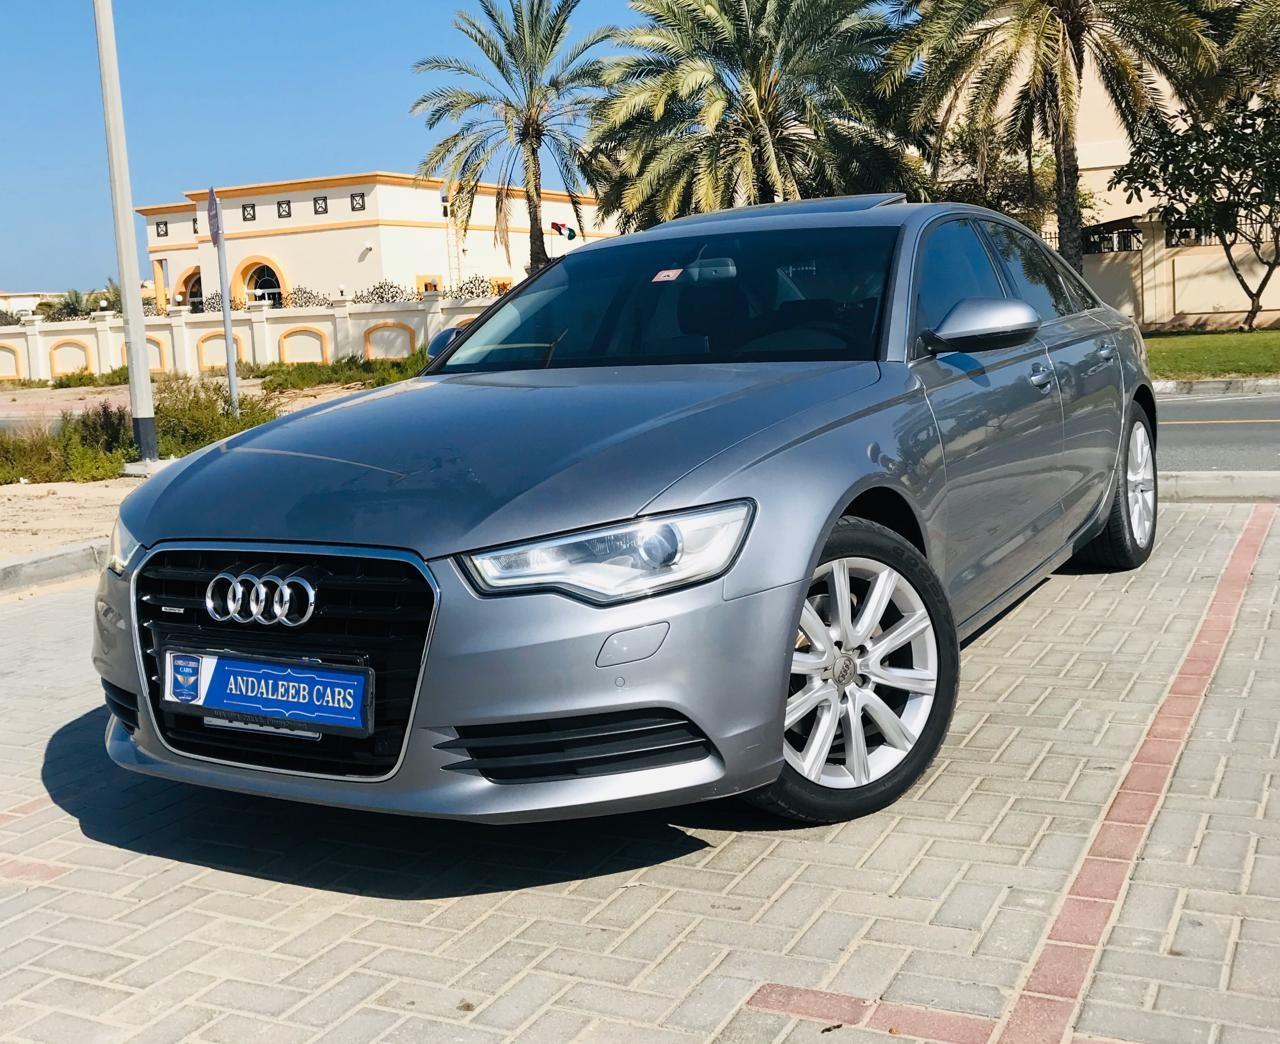 Kekurangan Audi 2015 Spesifikasi